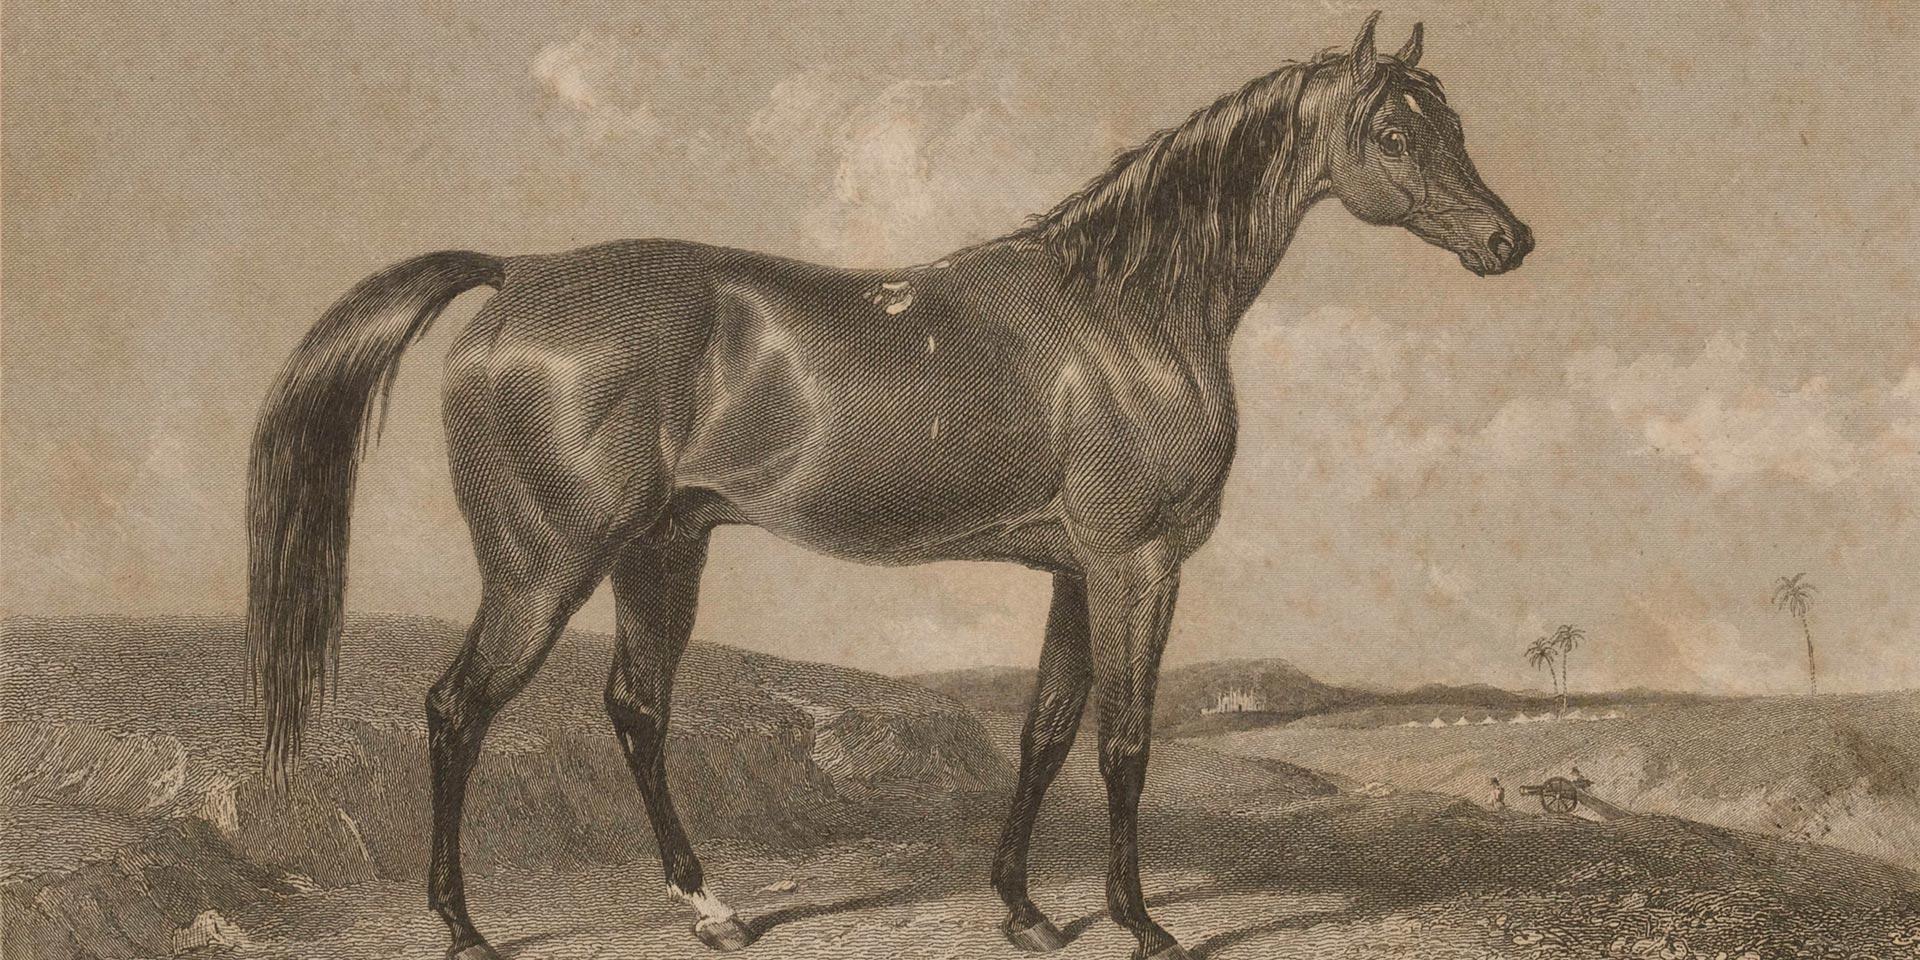 Aliwal in India, 1847